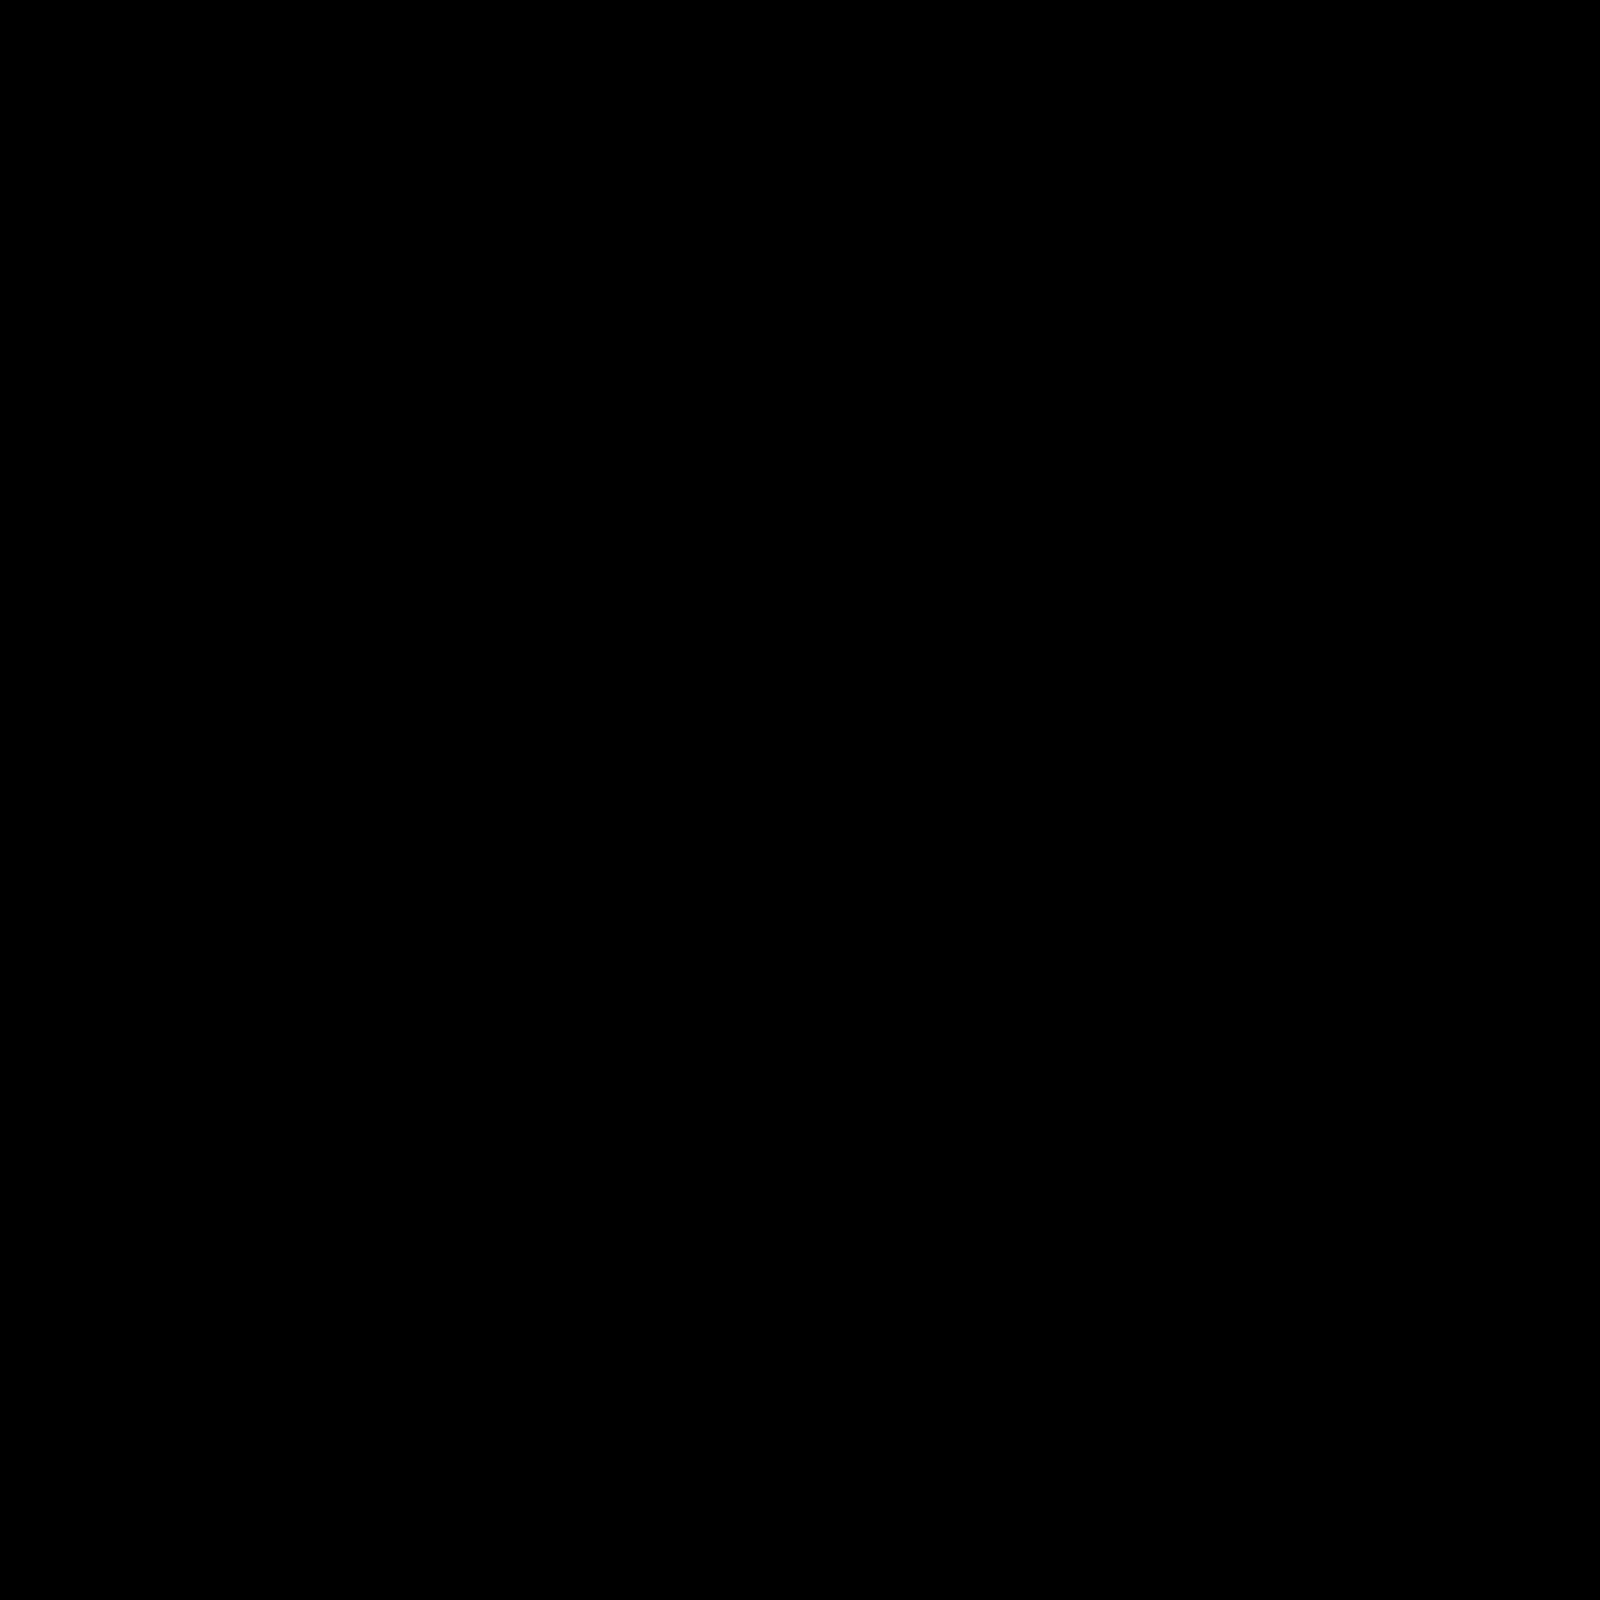 Venezuela Map Filled icon